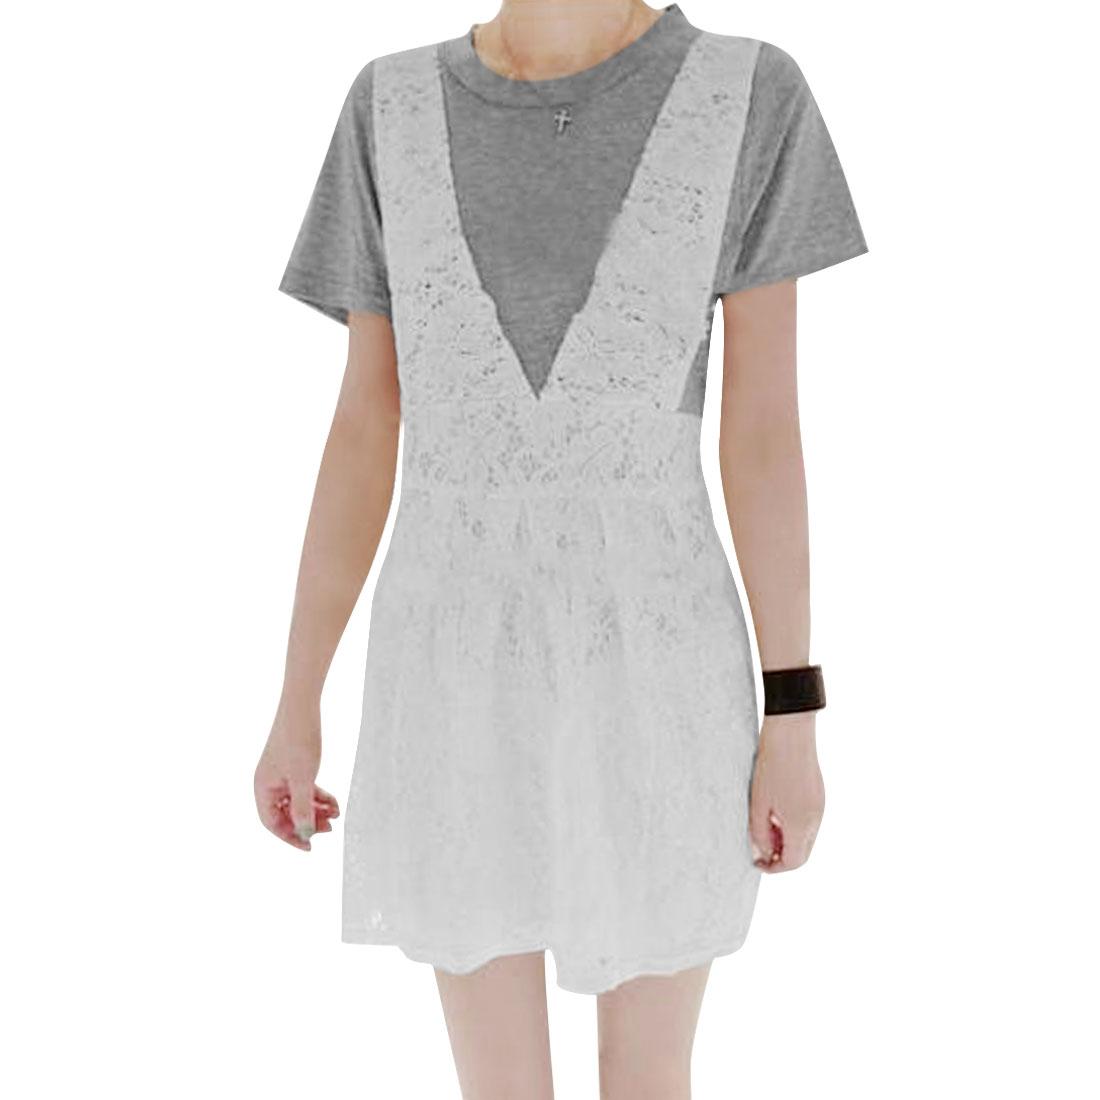 Lady Gray White Round Neck Short Sleeve Panel Round Hem Dress